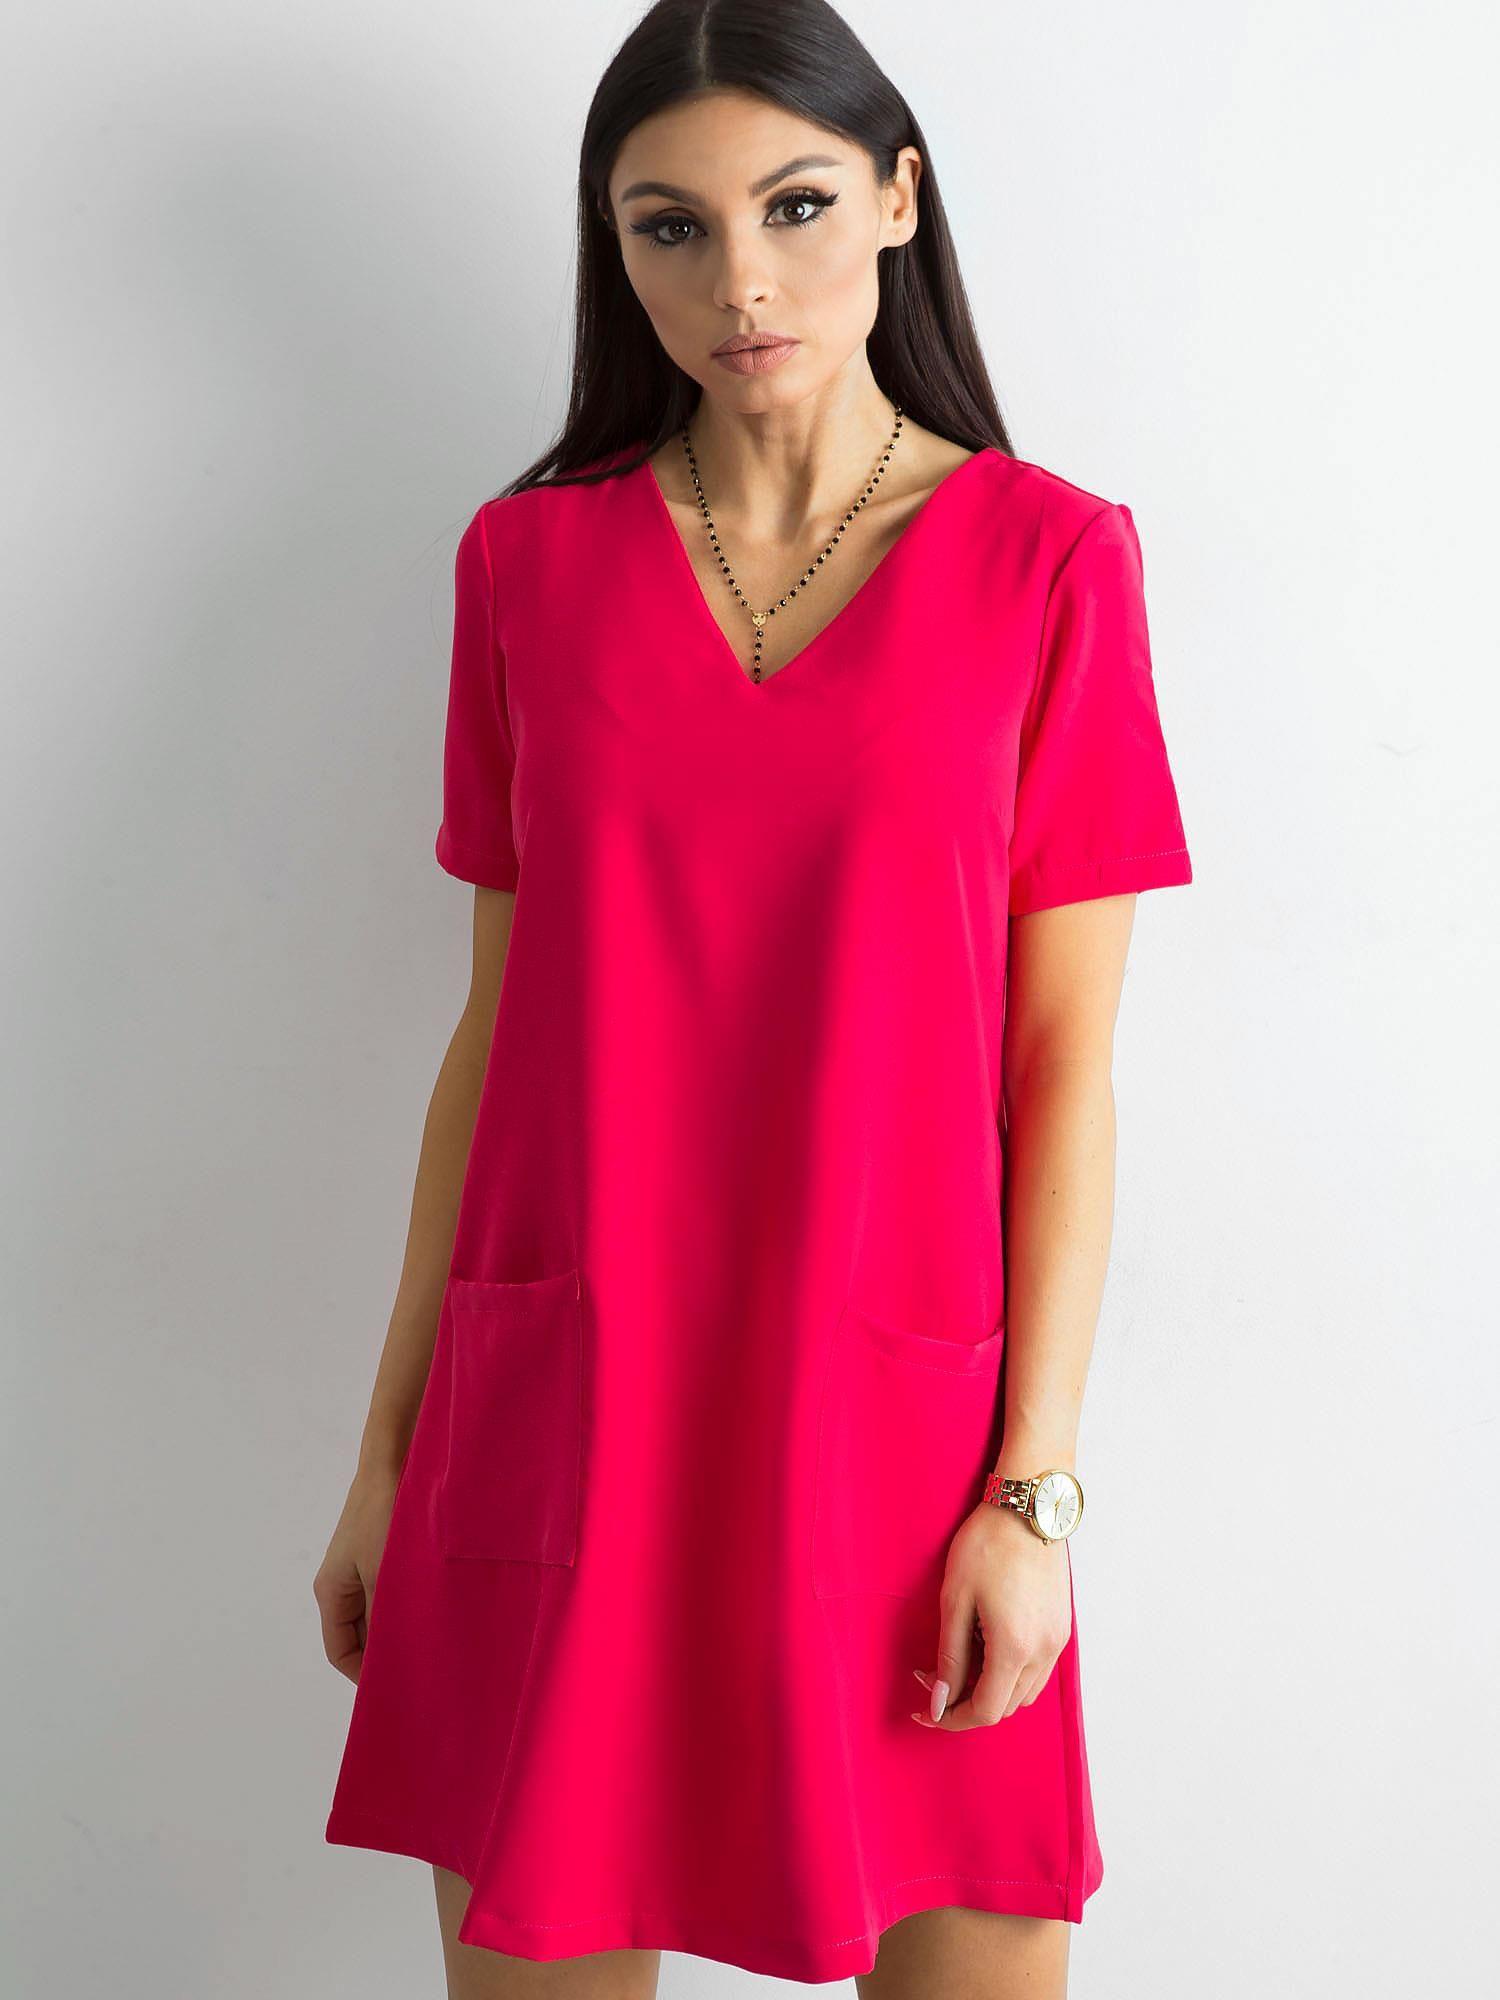 c78fda3d21 Różowa sukienka damska z kieszeniami - Sukienka koktajlowa - sklep eButik.pl